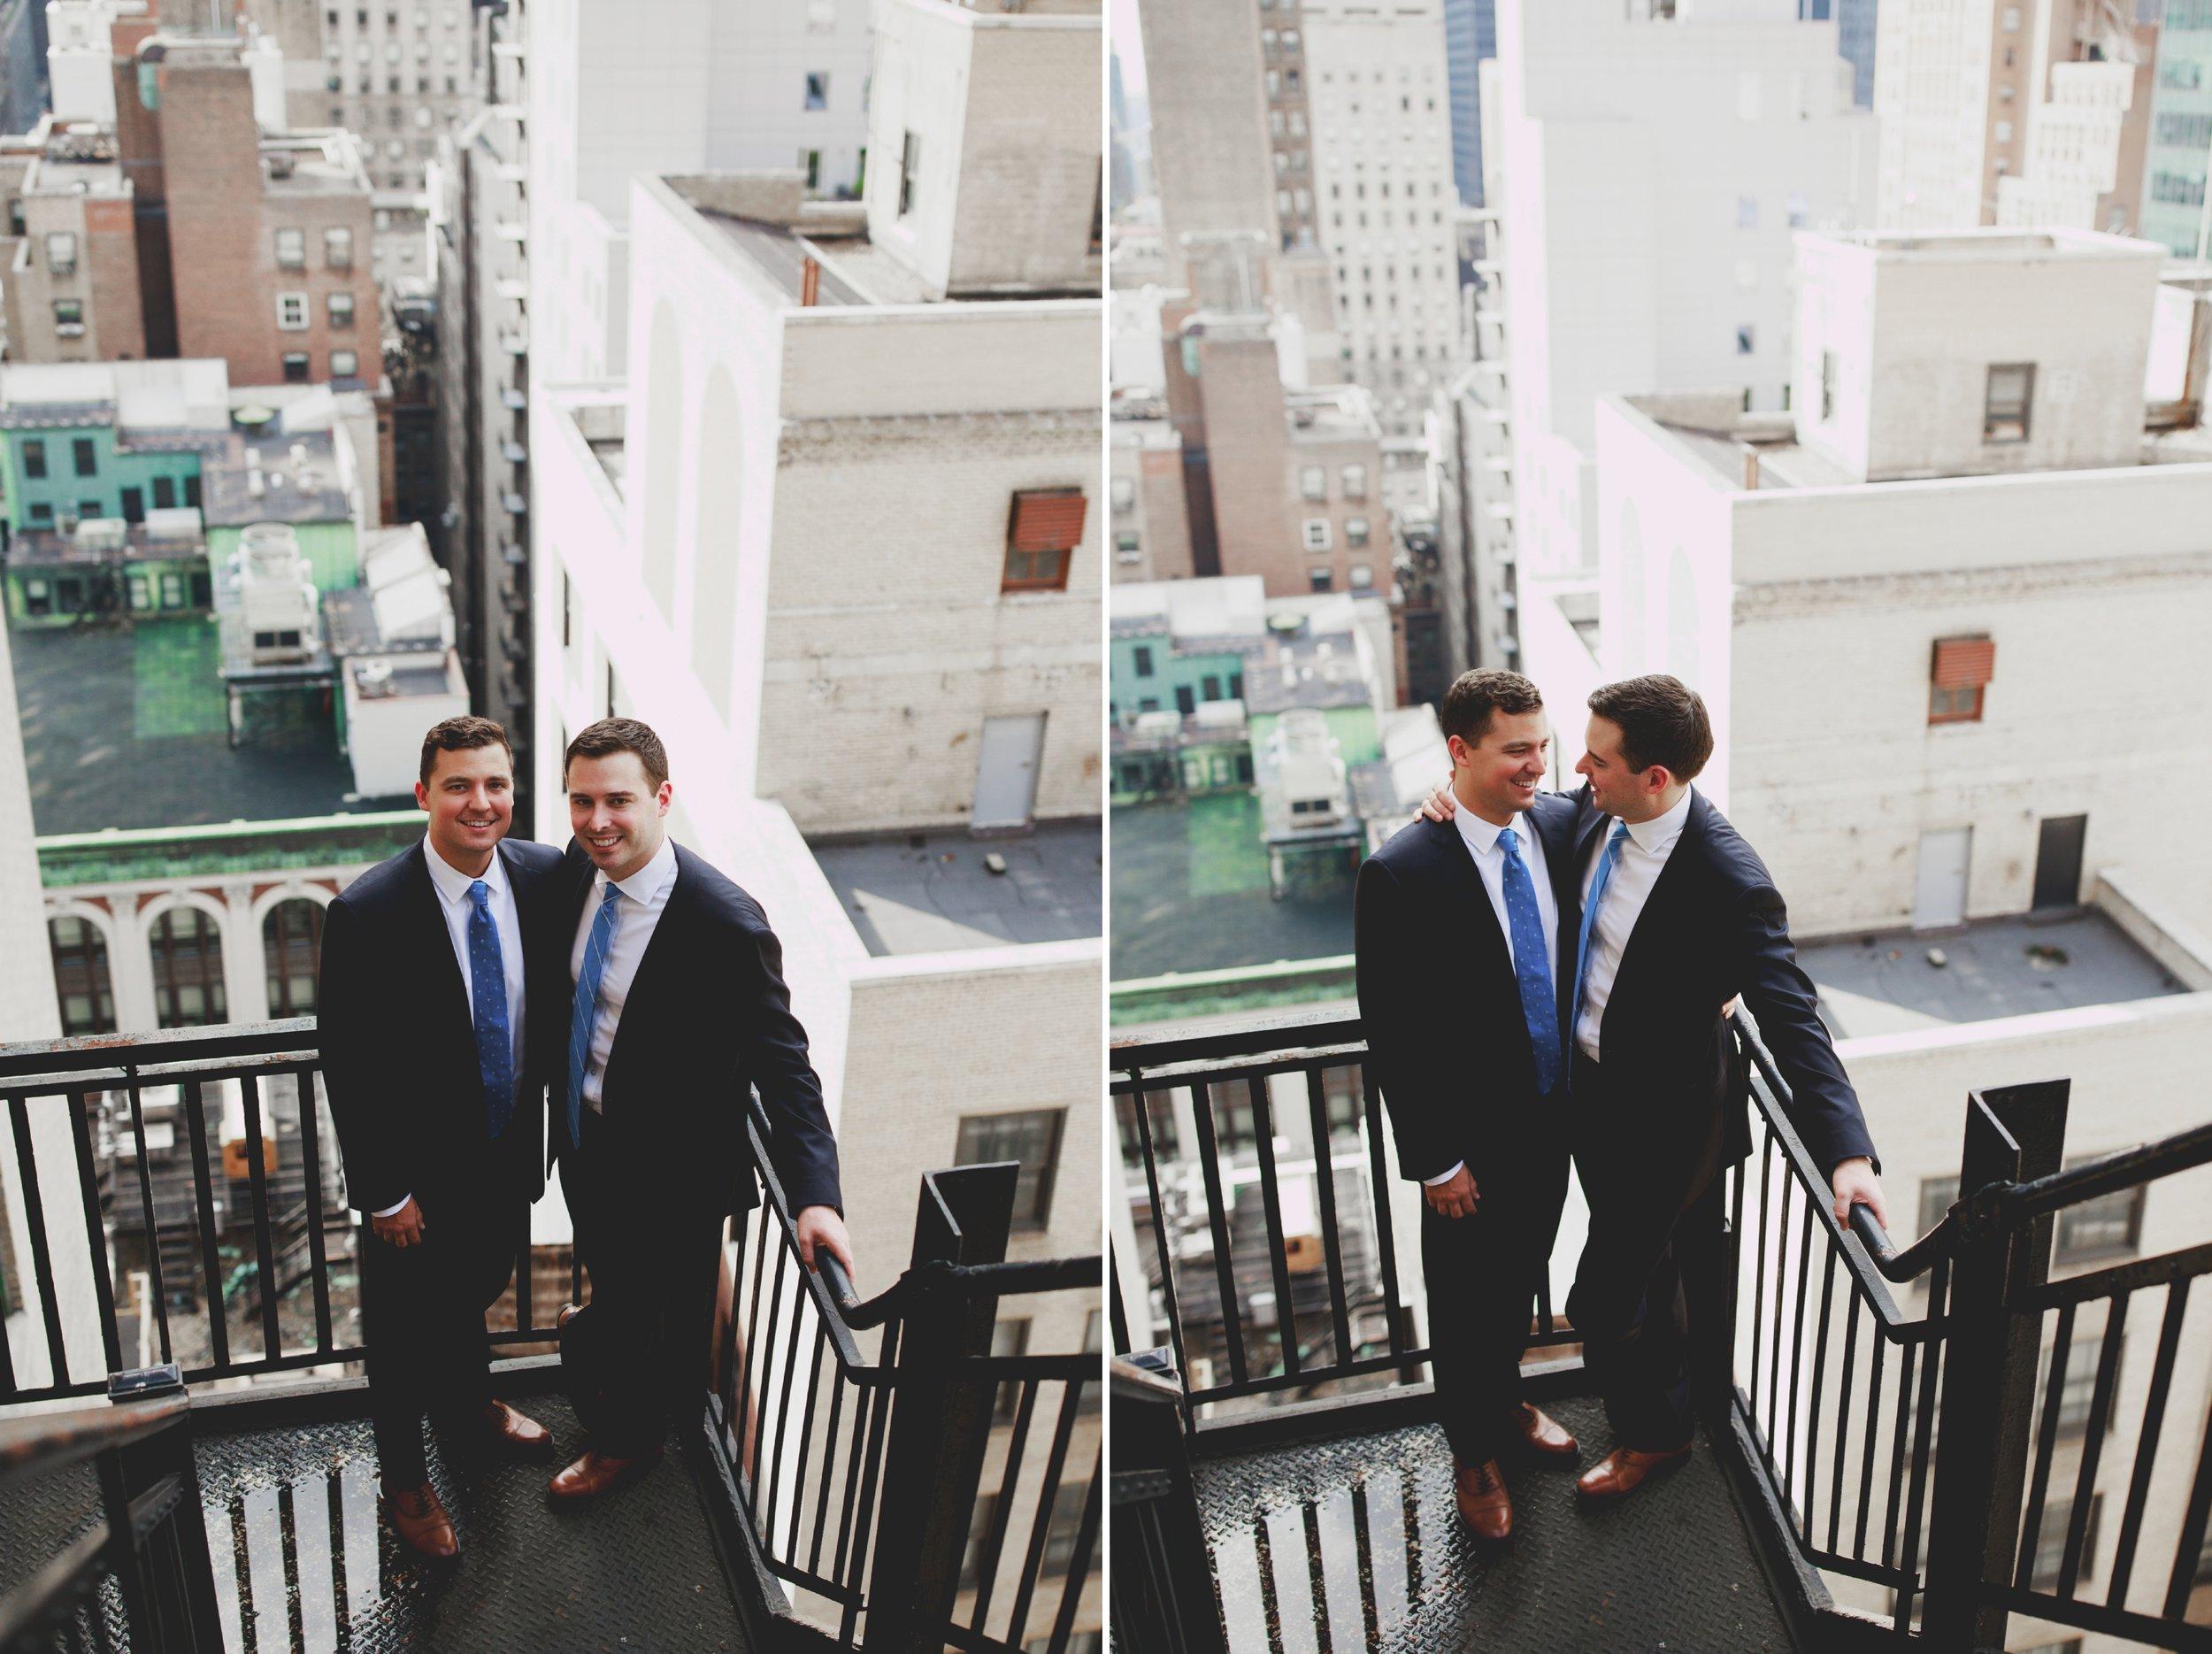 amanda_vanvels_new_york_lgbtq_gay_wedding_027.jpg